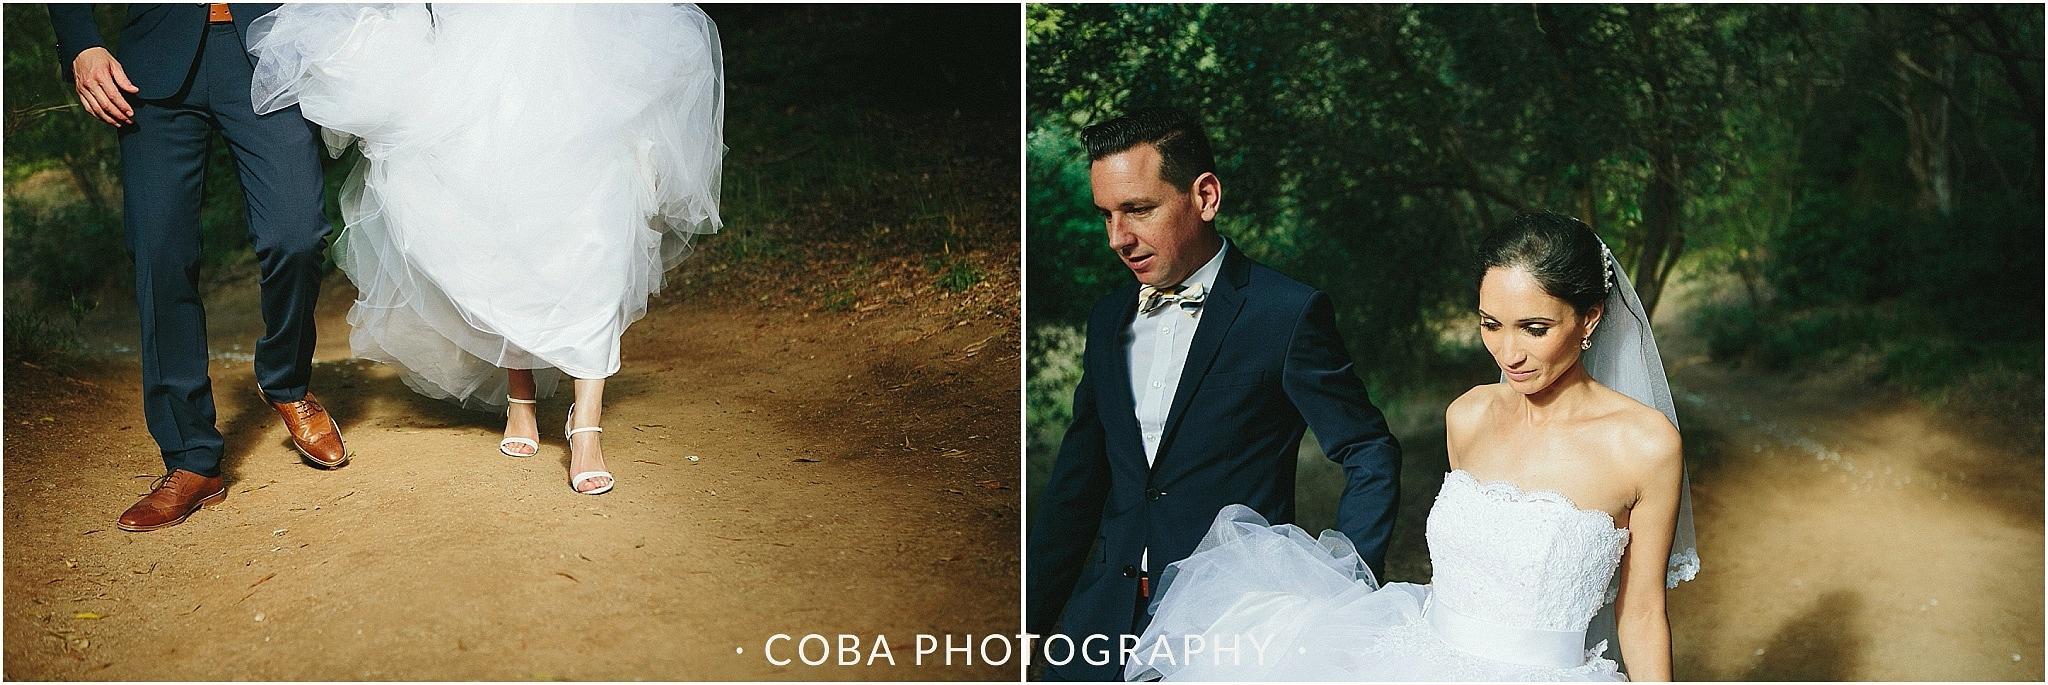 Marc&Melissa - Cascade Manor - Coba Photography (171)